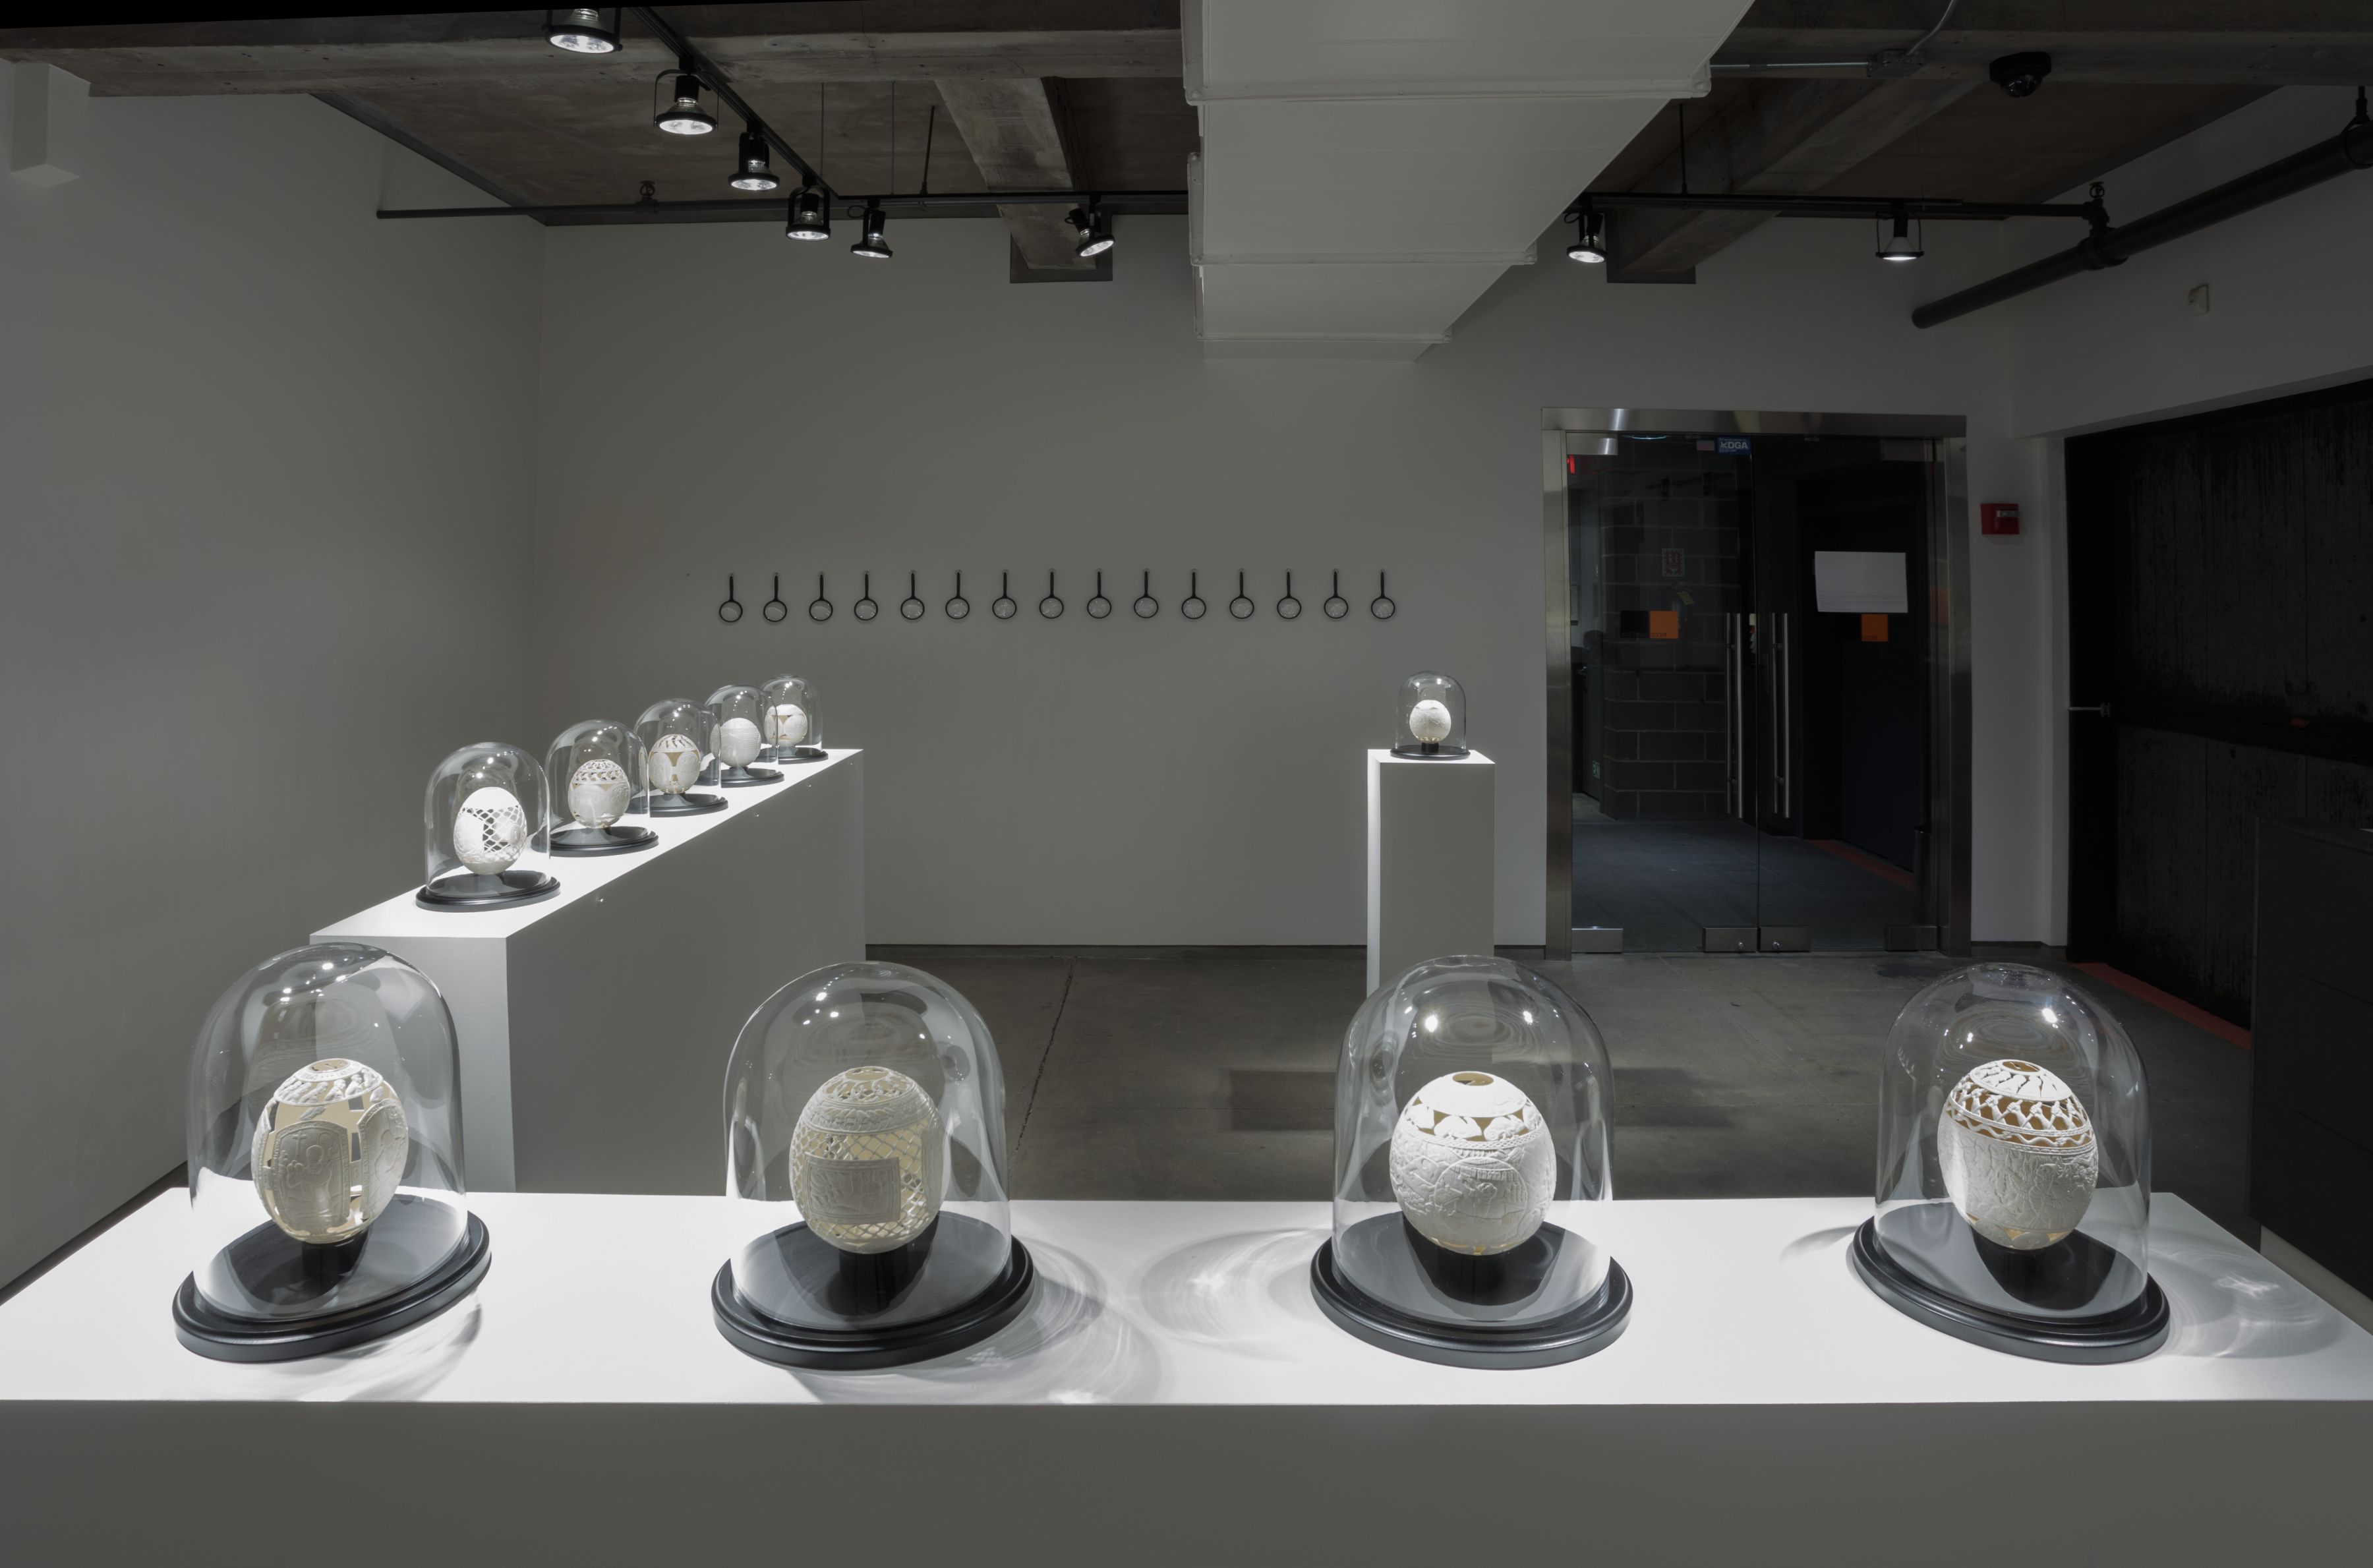 Installation view, Gil Batle at Ricco/Maresca Gallery, 2018